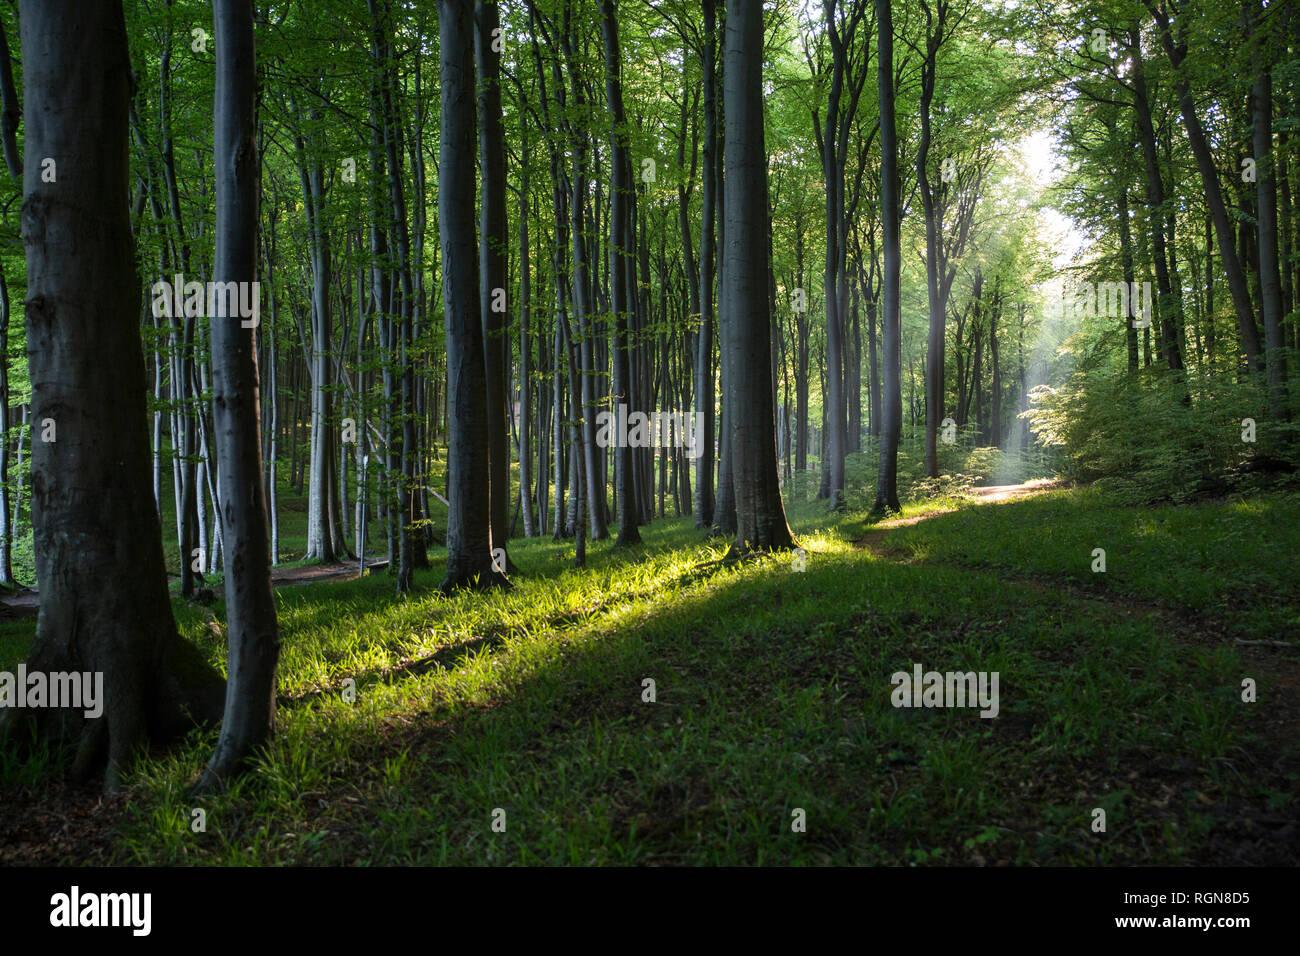 Germany, Mecklenburg-Western Pomerania, Ruegen, Jasmund National Park, Beech forest Stock Photo